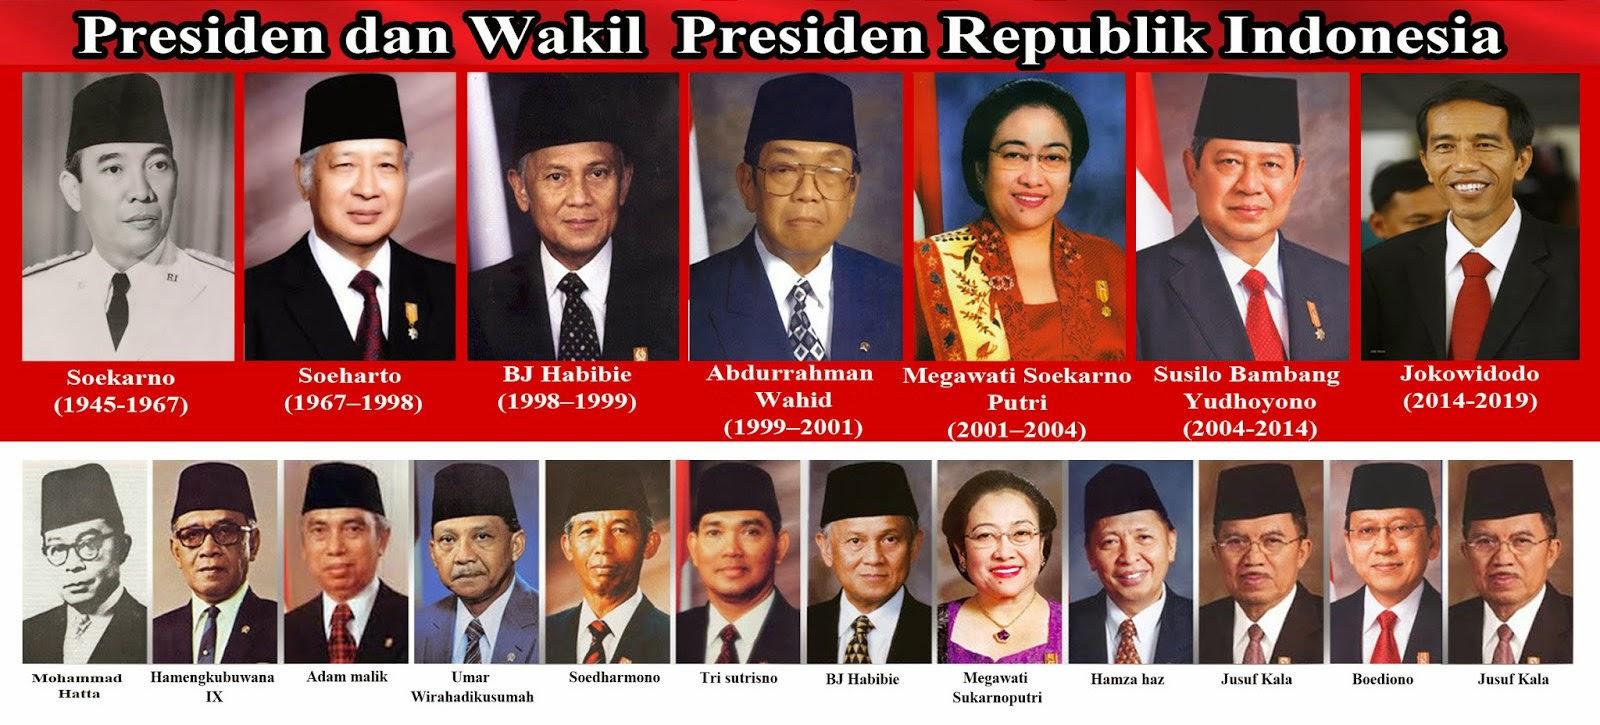 Lowongan Guru Di Blitar Lowongan Kerja Terbaru Jobindo Presiden Dan Wakil Presiden Ri 1945 Hingga Kini Pknonline